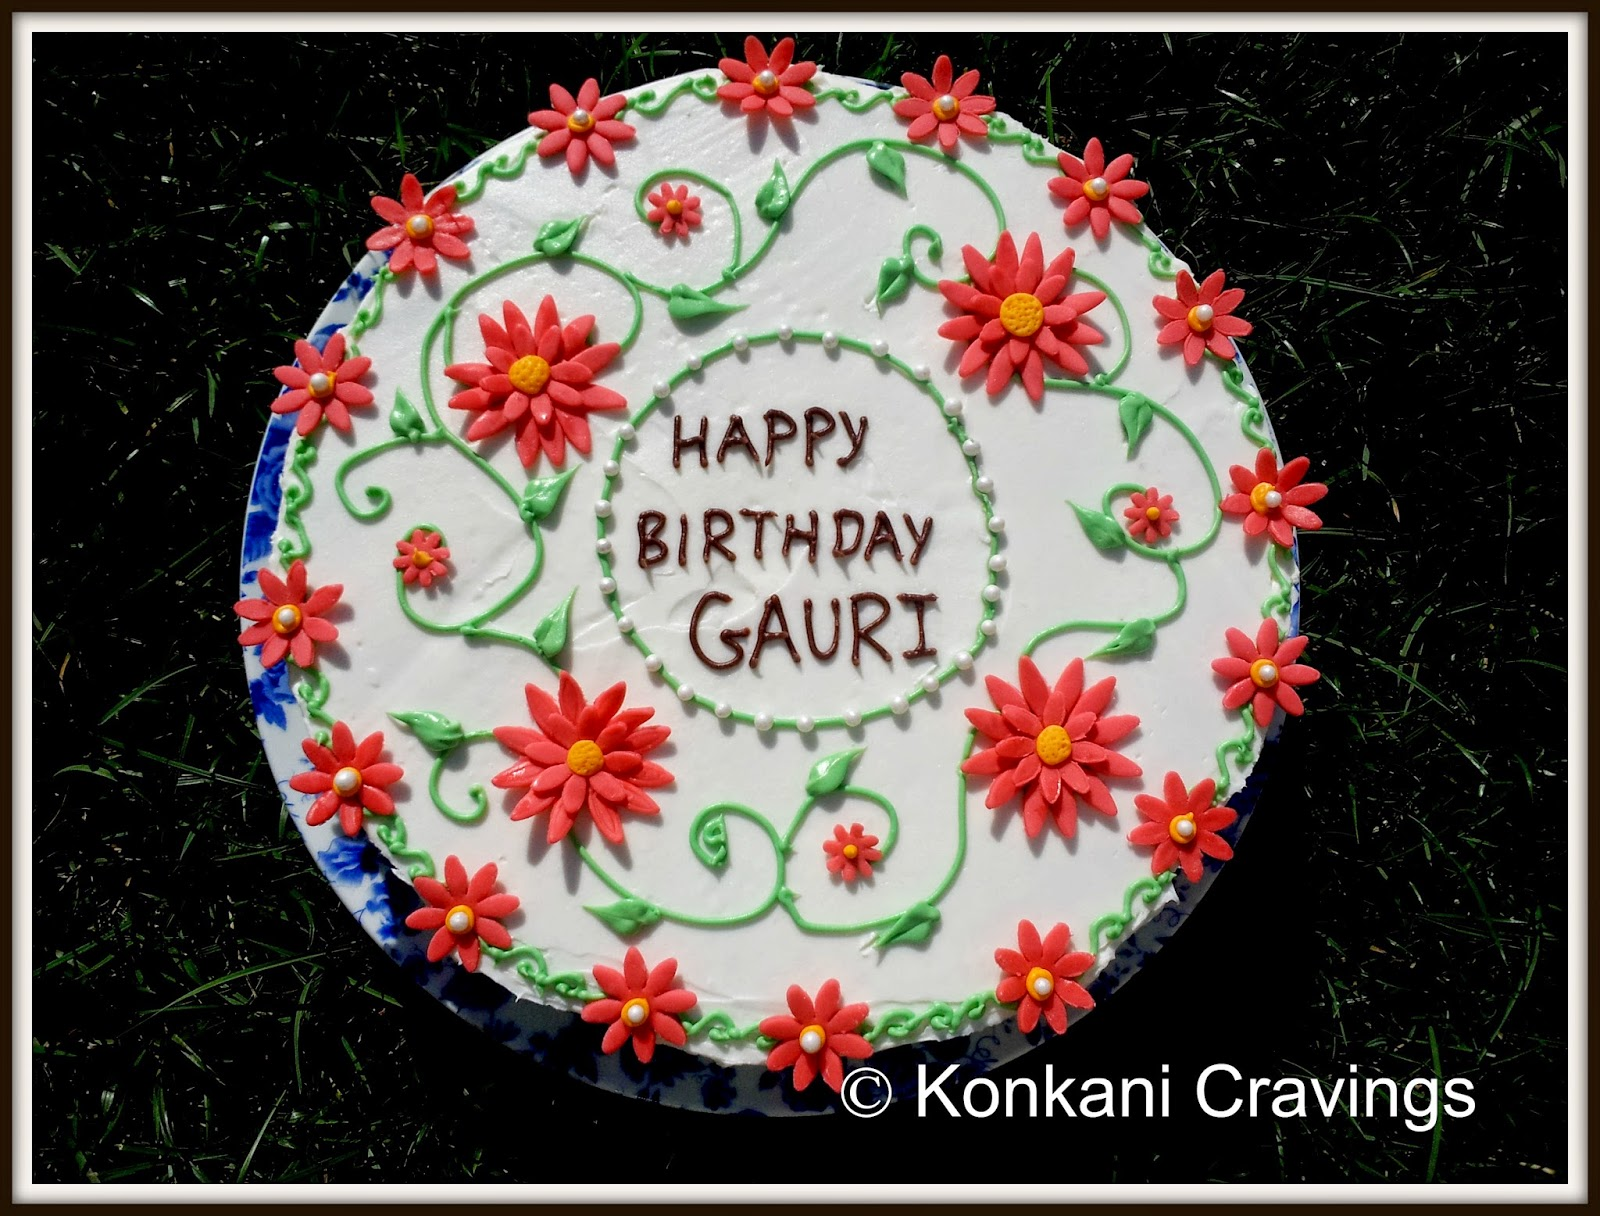 KONKANI CRAVINGS Birthday Cake With Fondant Flowers